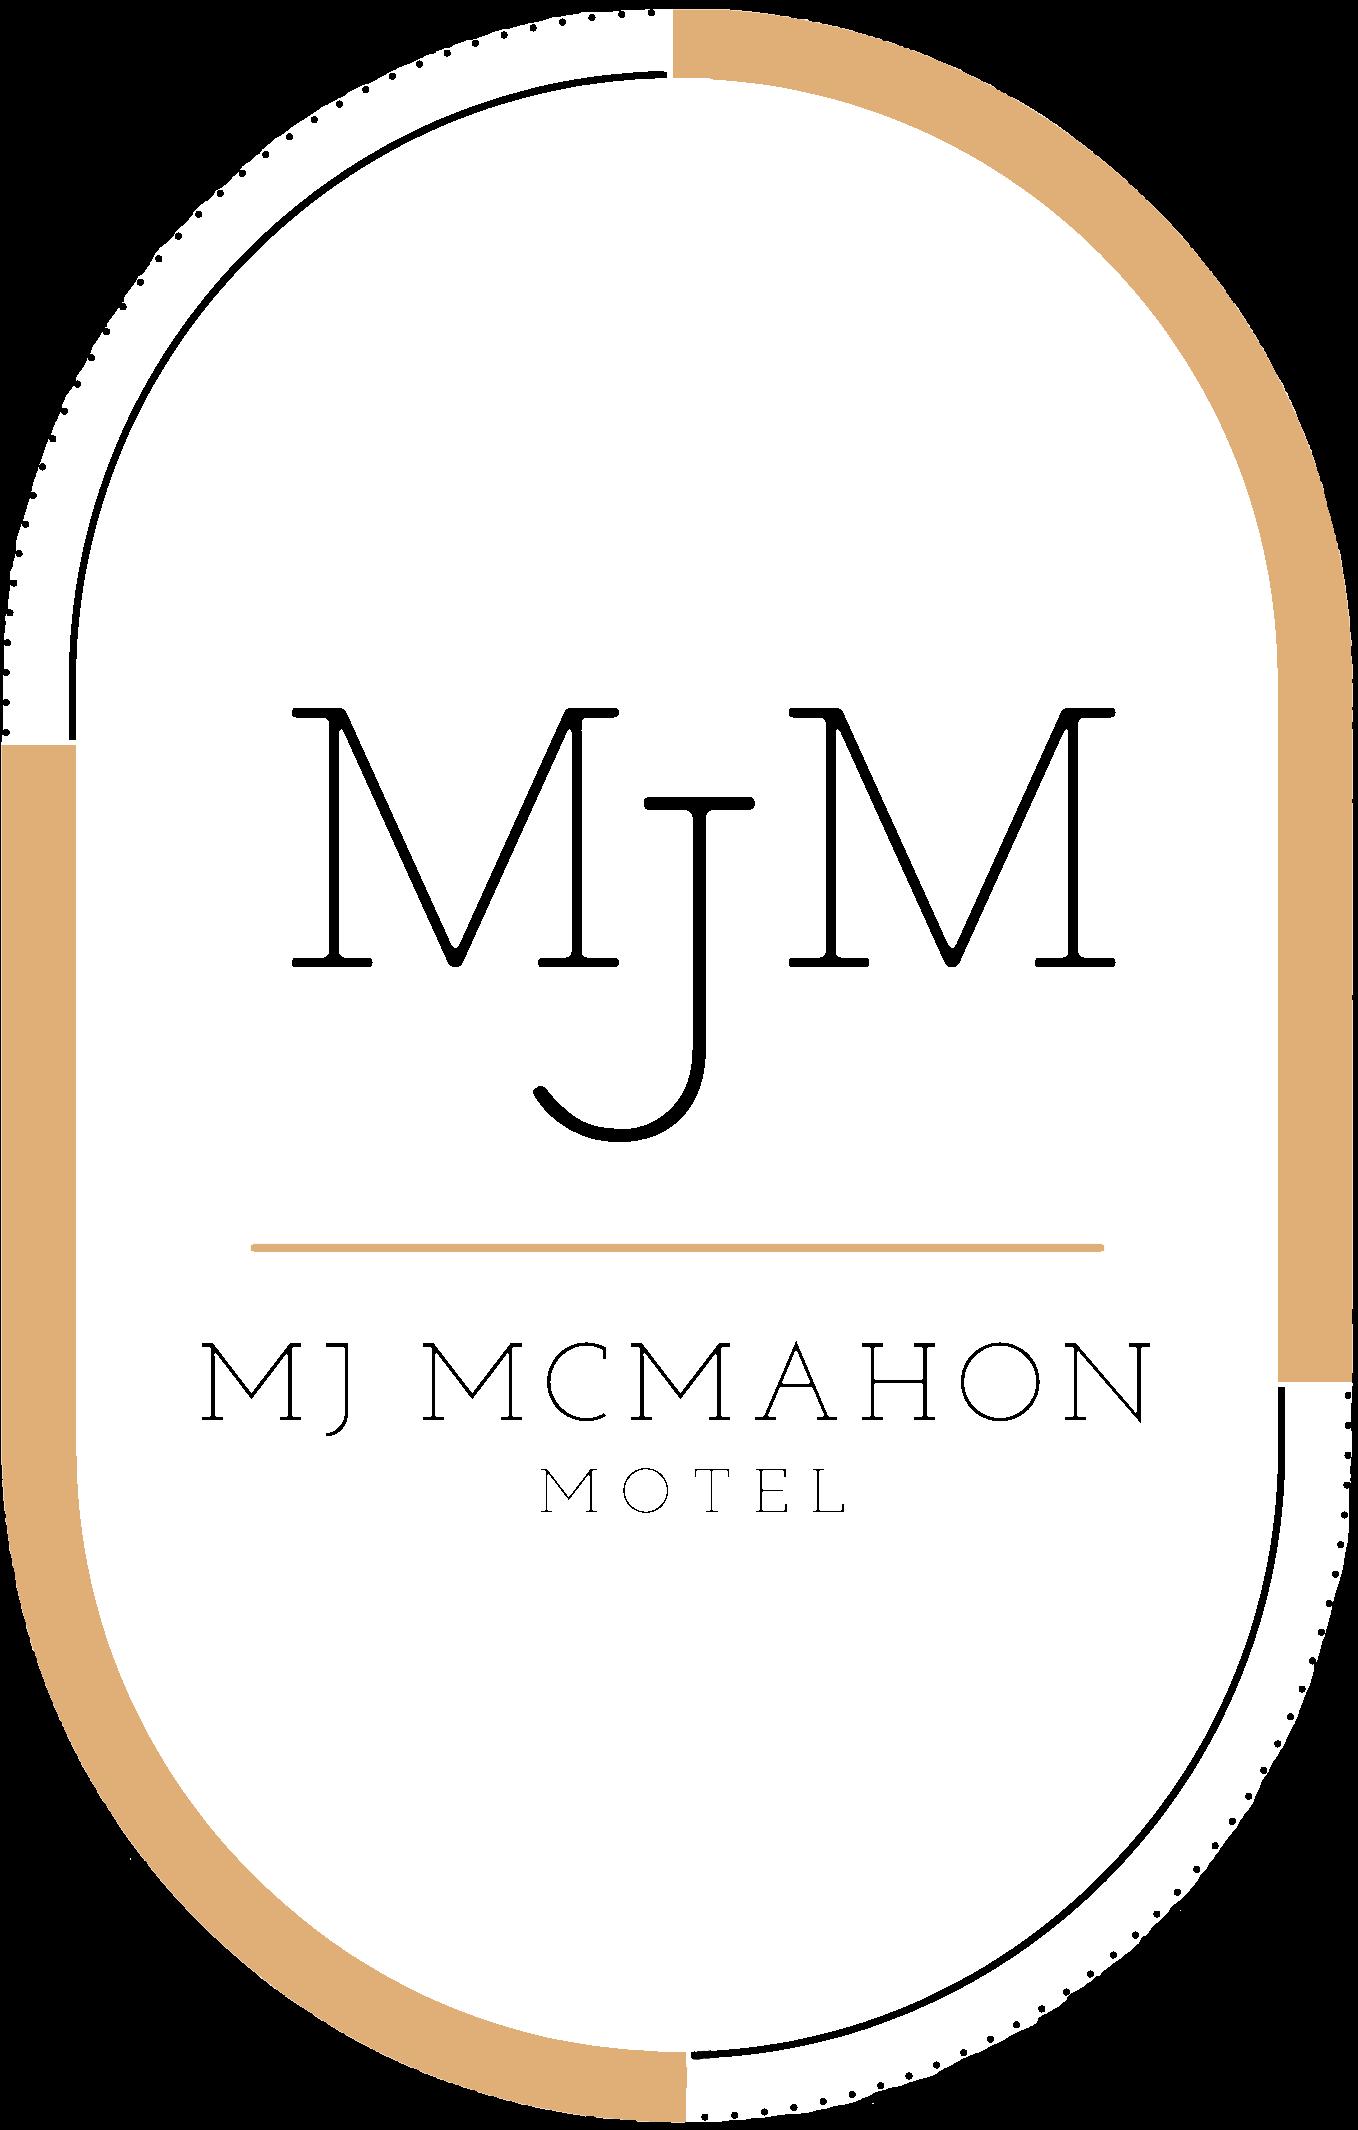 MJ McMahon Motel